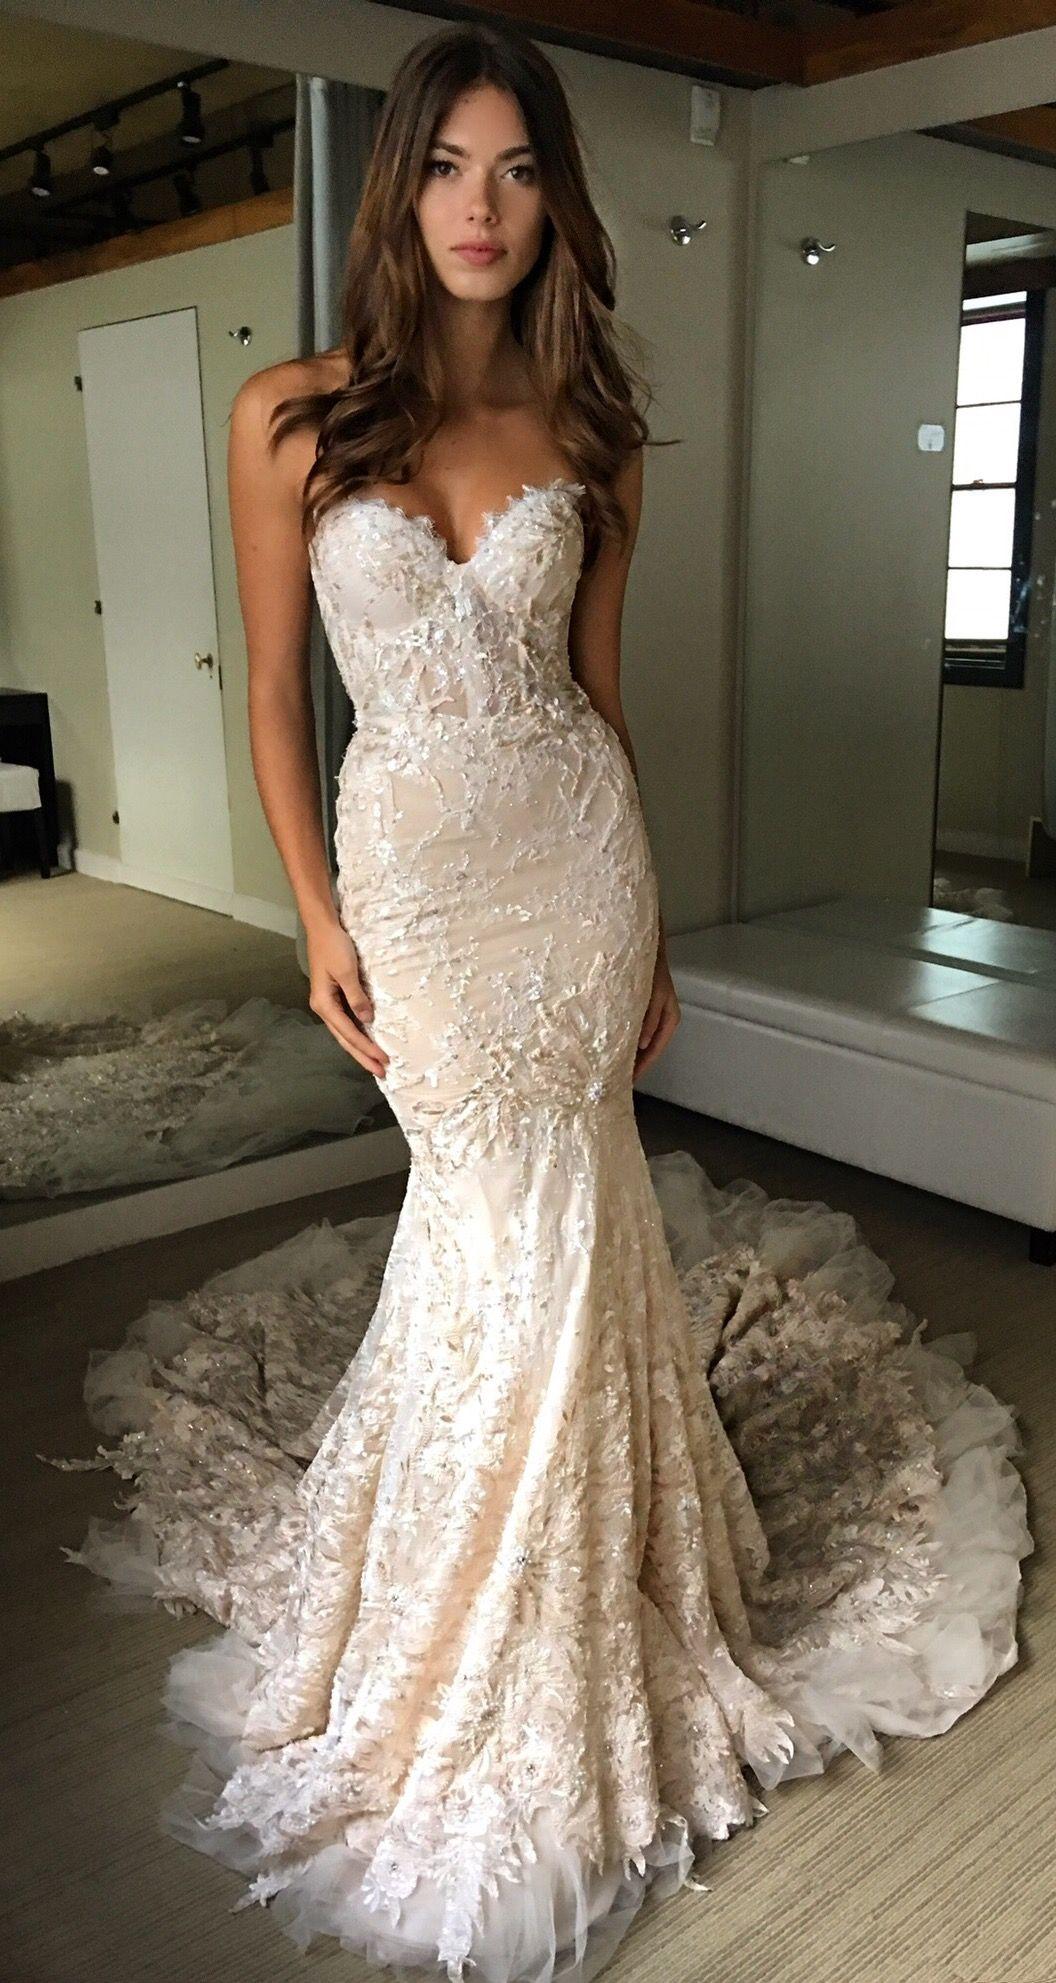 Mermaid dress wedding  BERTA style    Beautiful Wedding Dresses  Pinterest